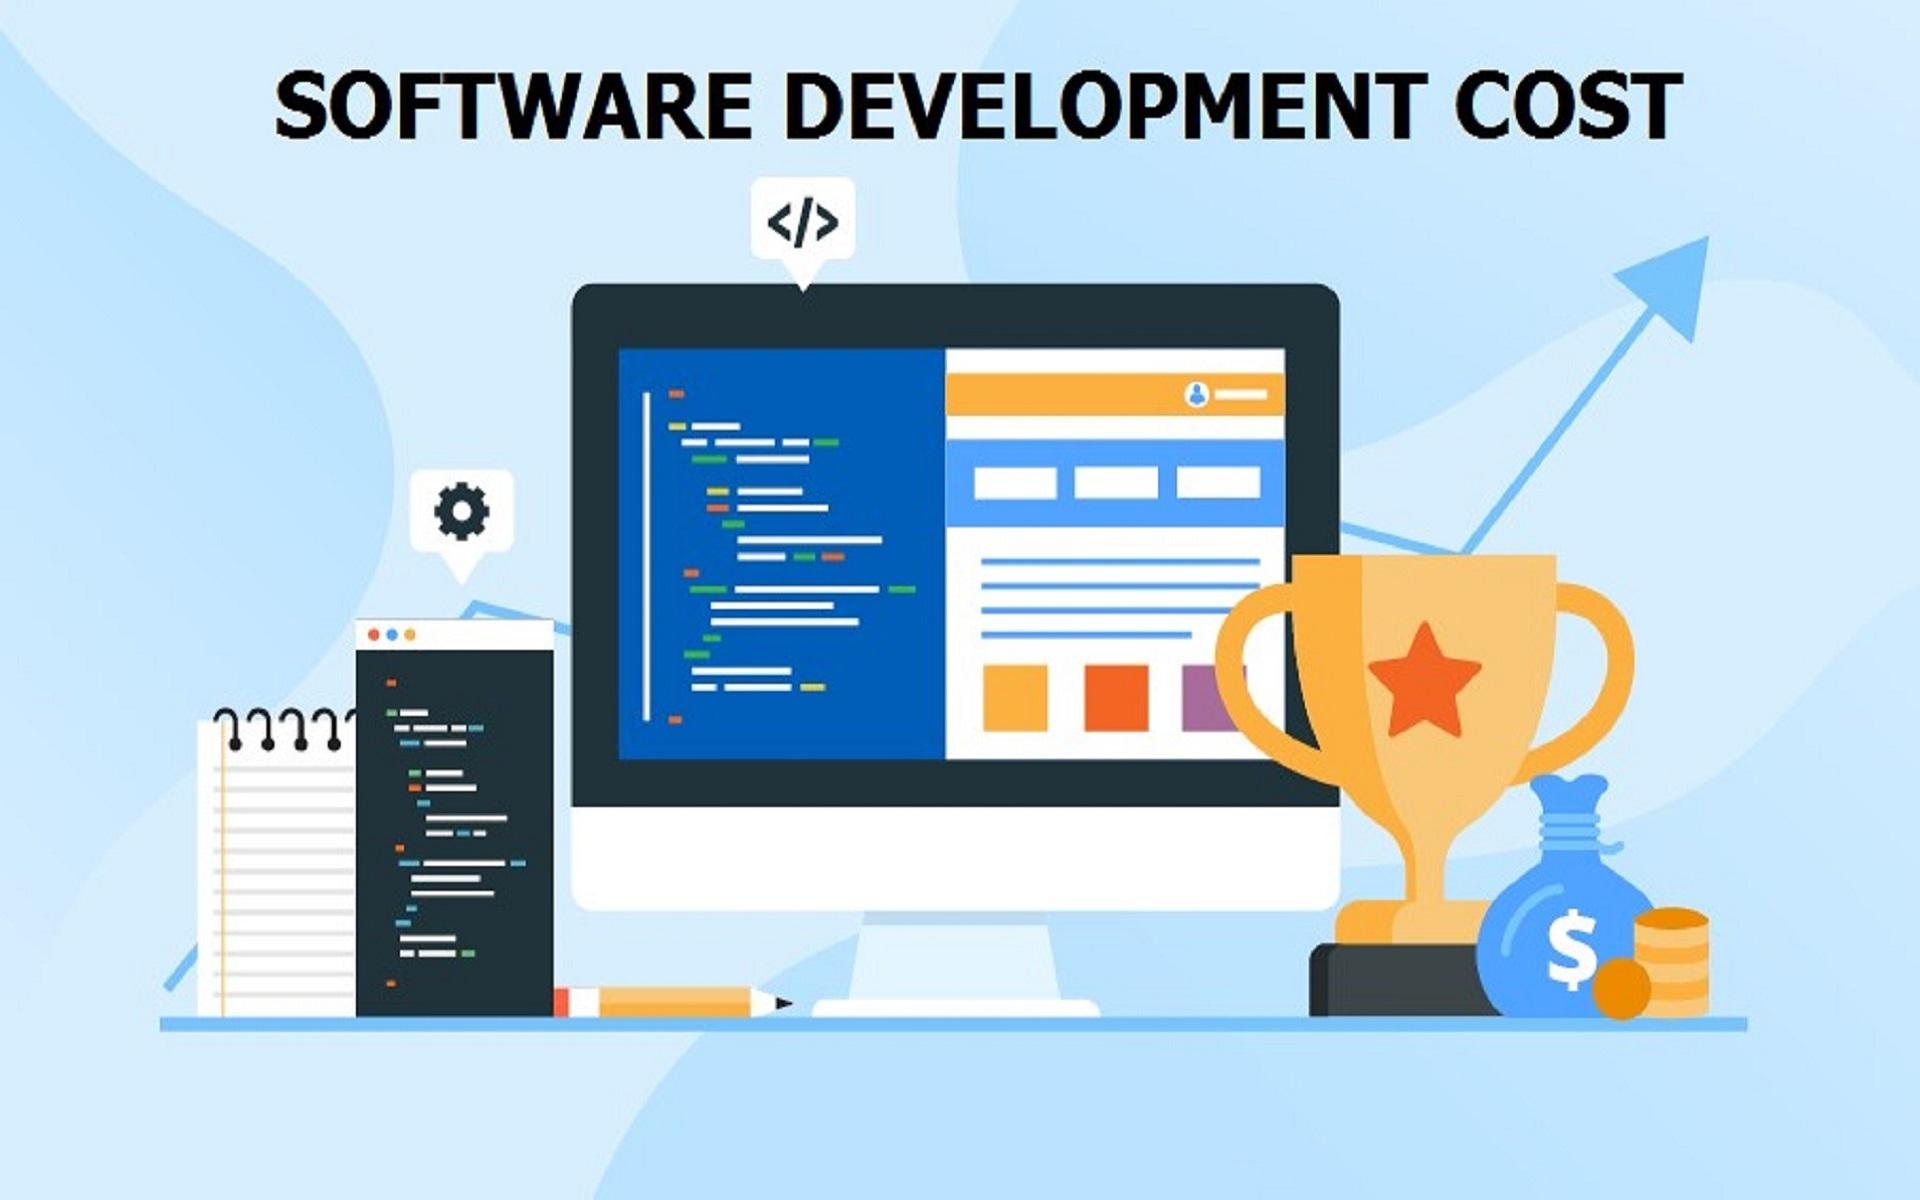 Software Development Cost